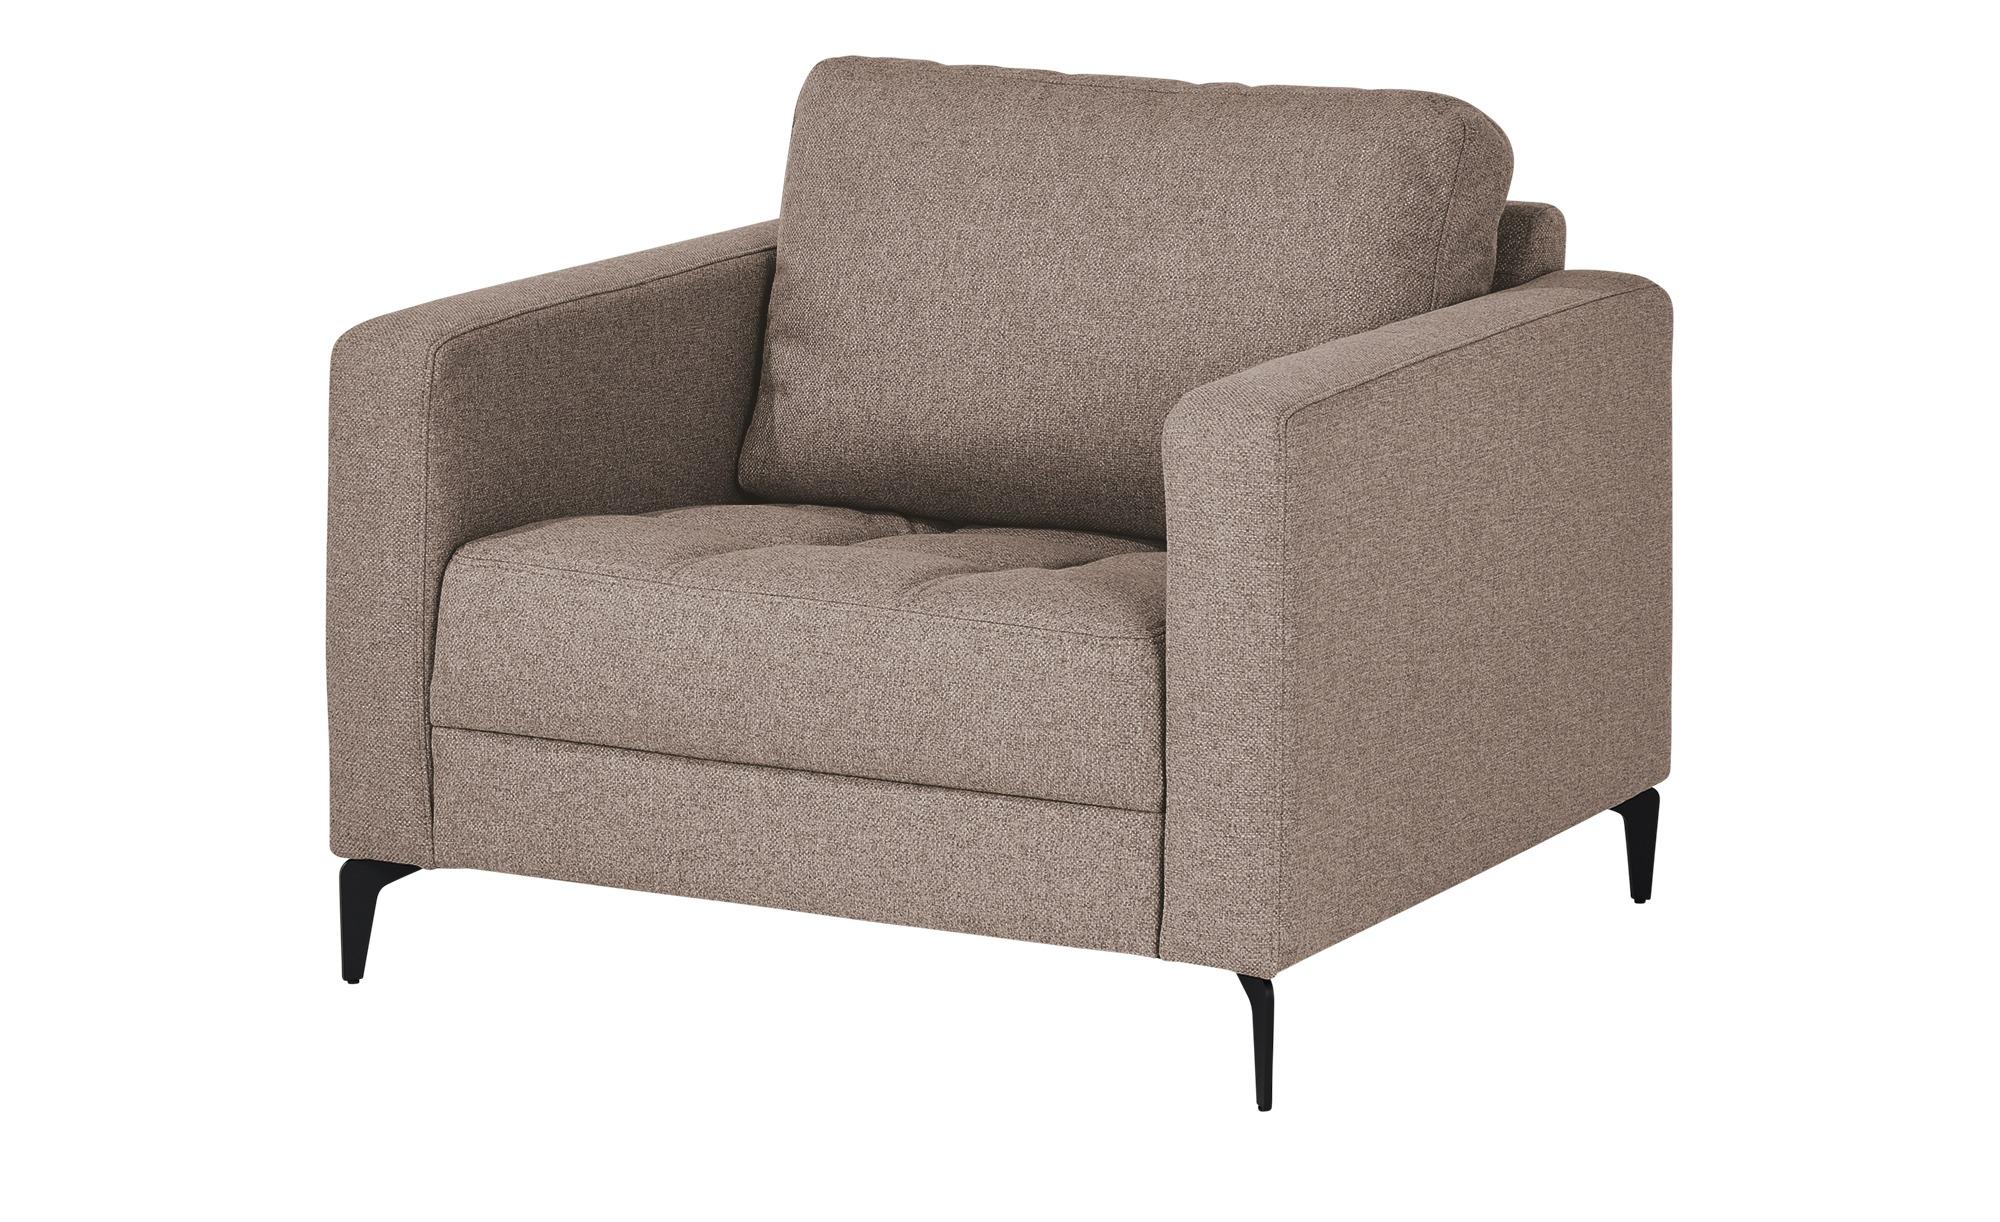 smart Sessel  Gesa ¦ braun ¦ Maße (cm): B: 102 H: 83 T: 91 Polstermöbel > Sessel > Polstersessel - Höffner